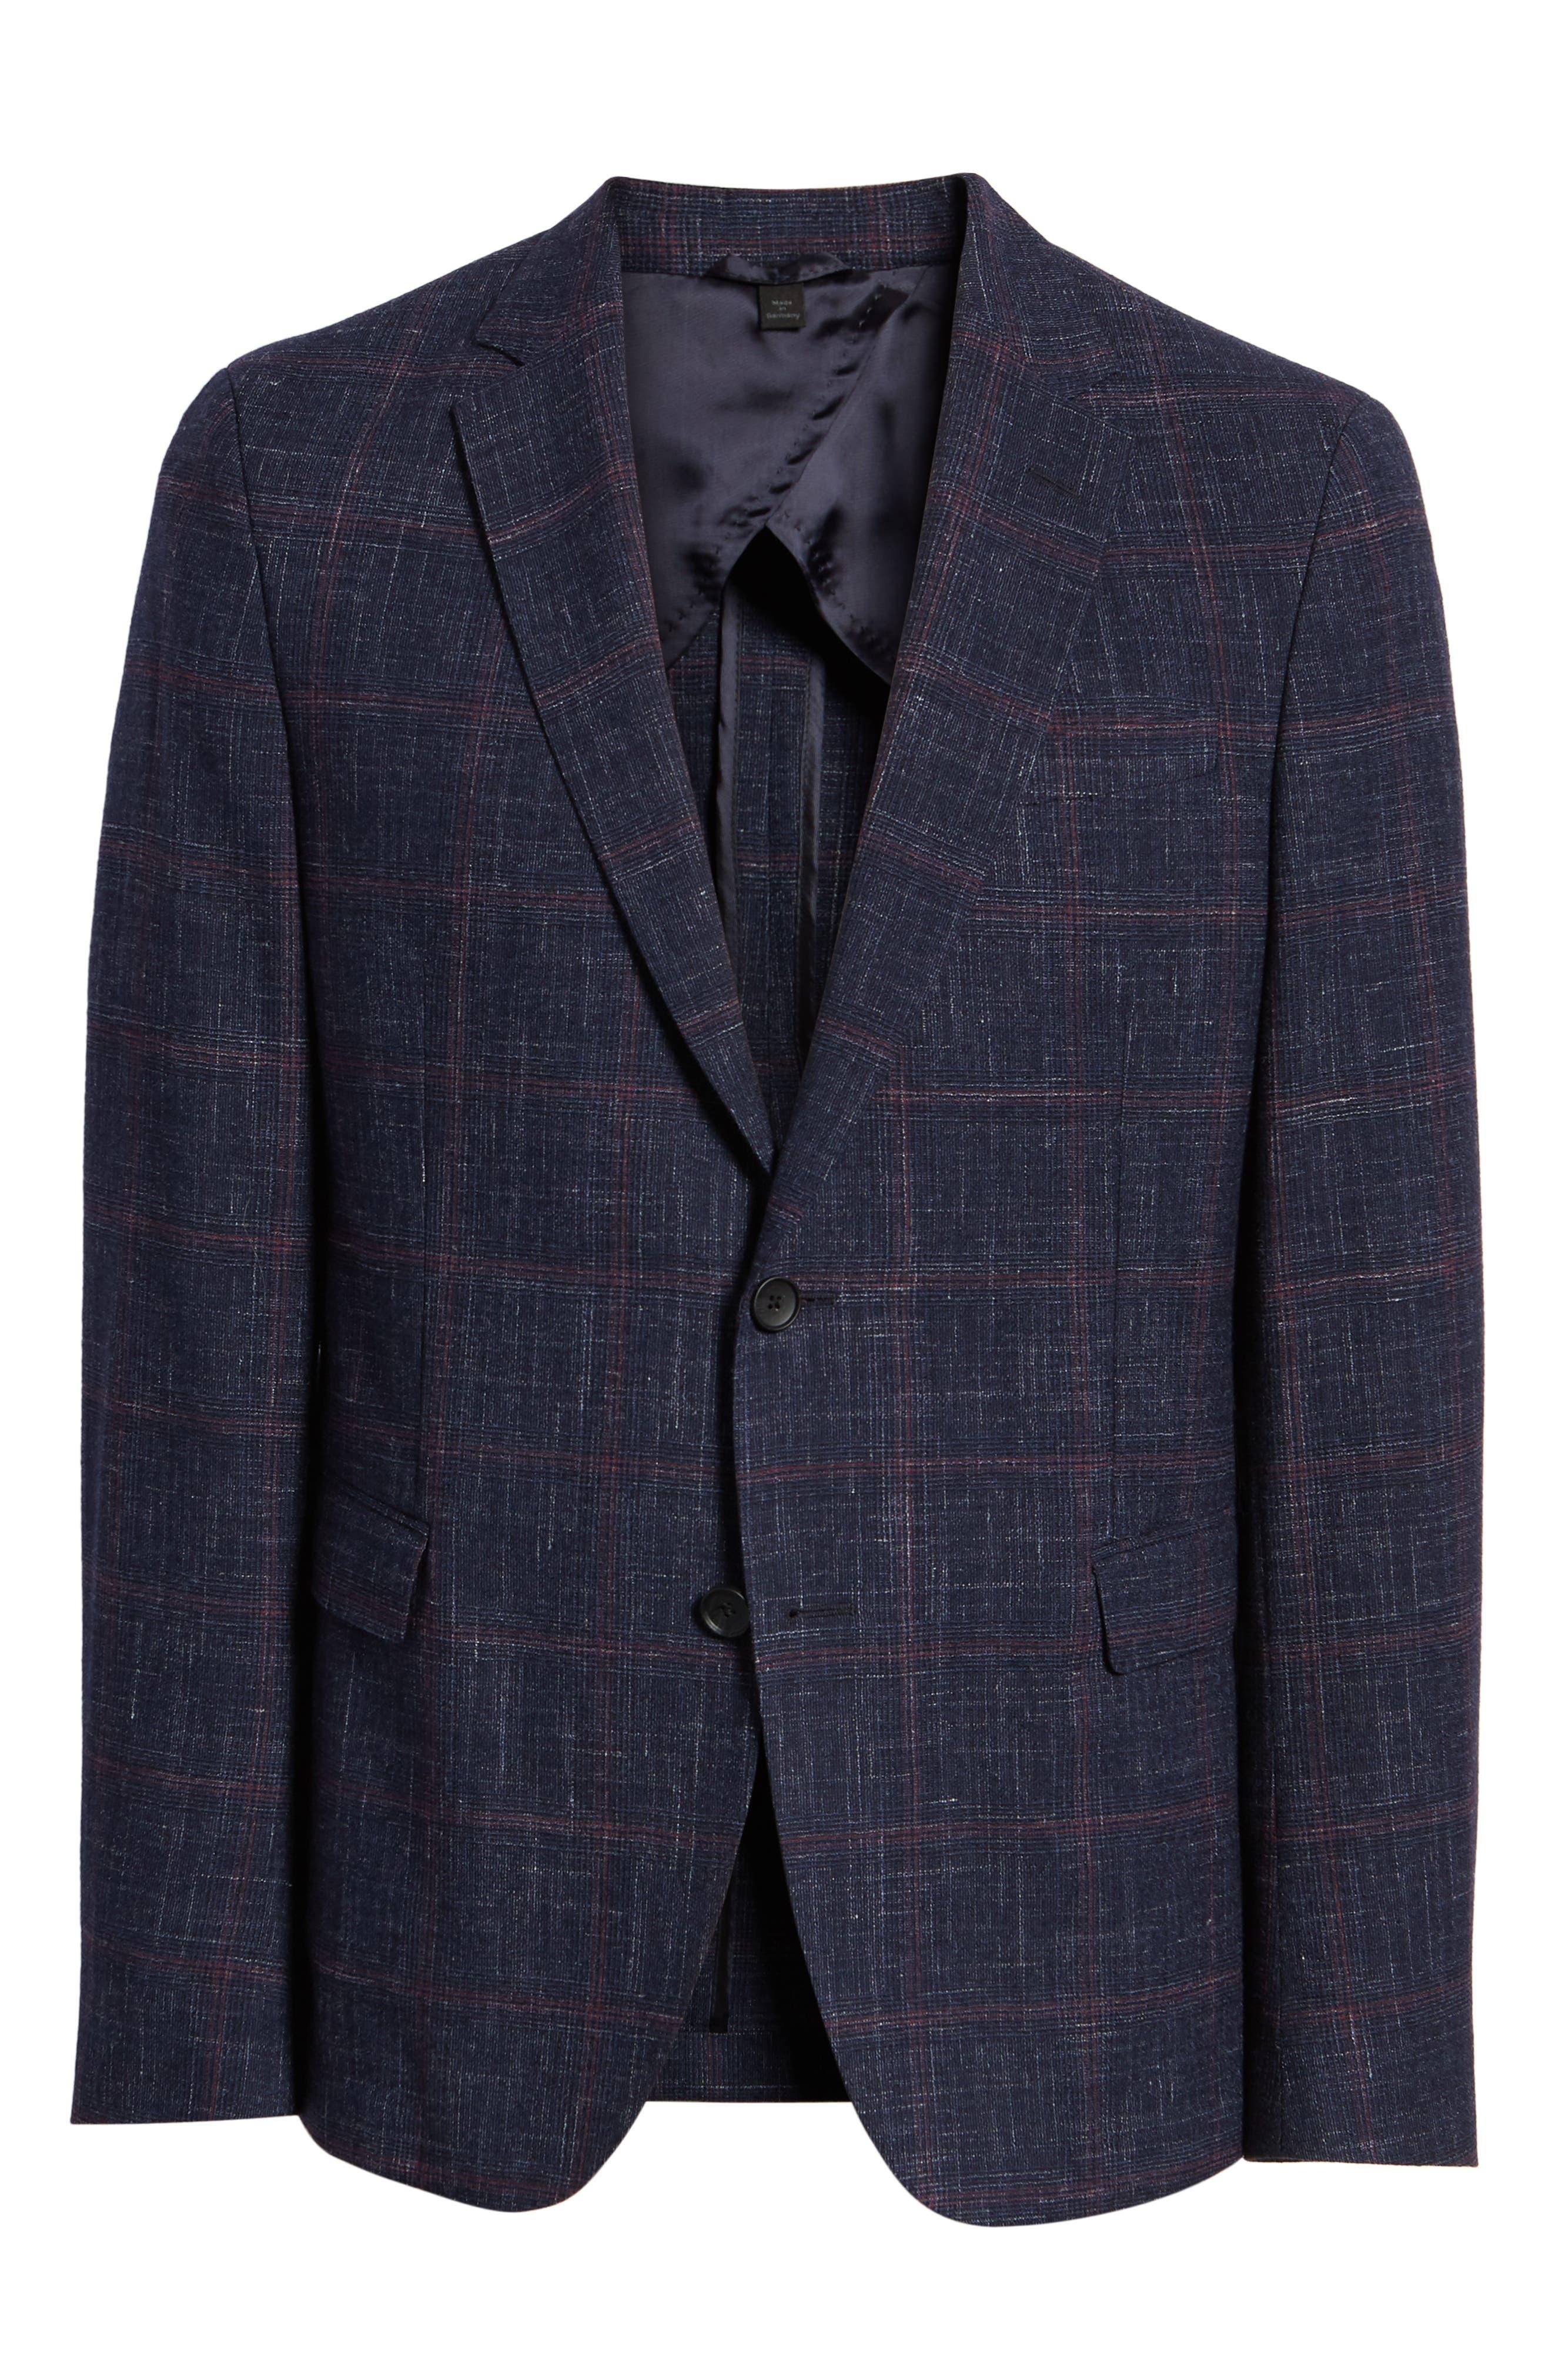 Nobis Trim Fit Plaid Wool Blend Sport Coat,                             Alternate thumbnail 5, color,                             DARK BLUE